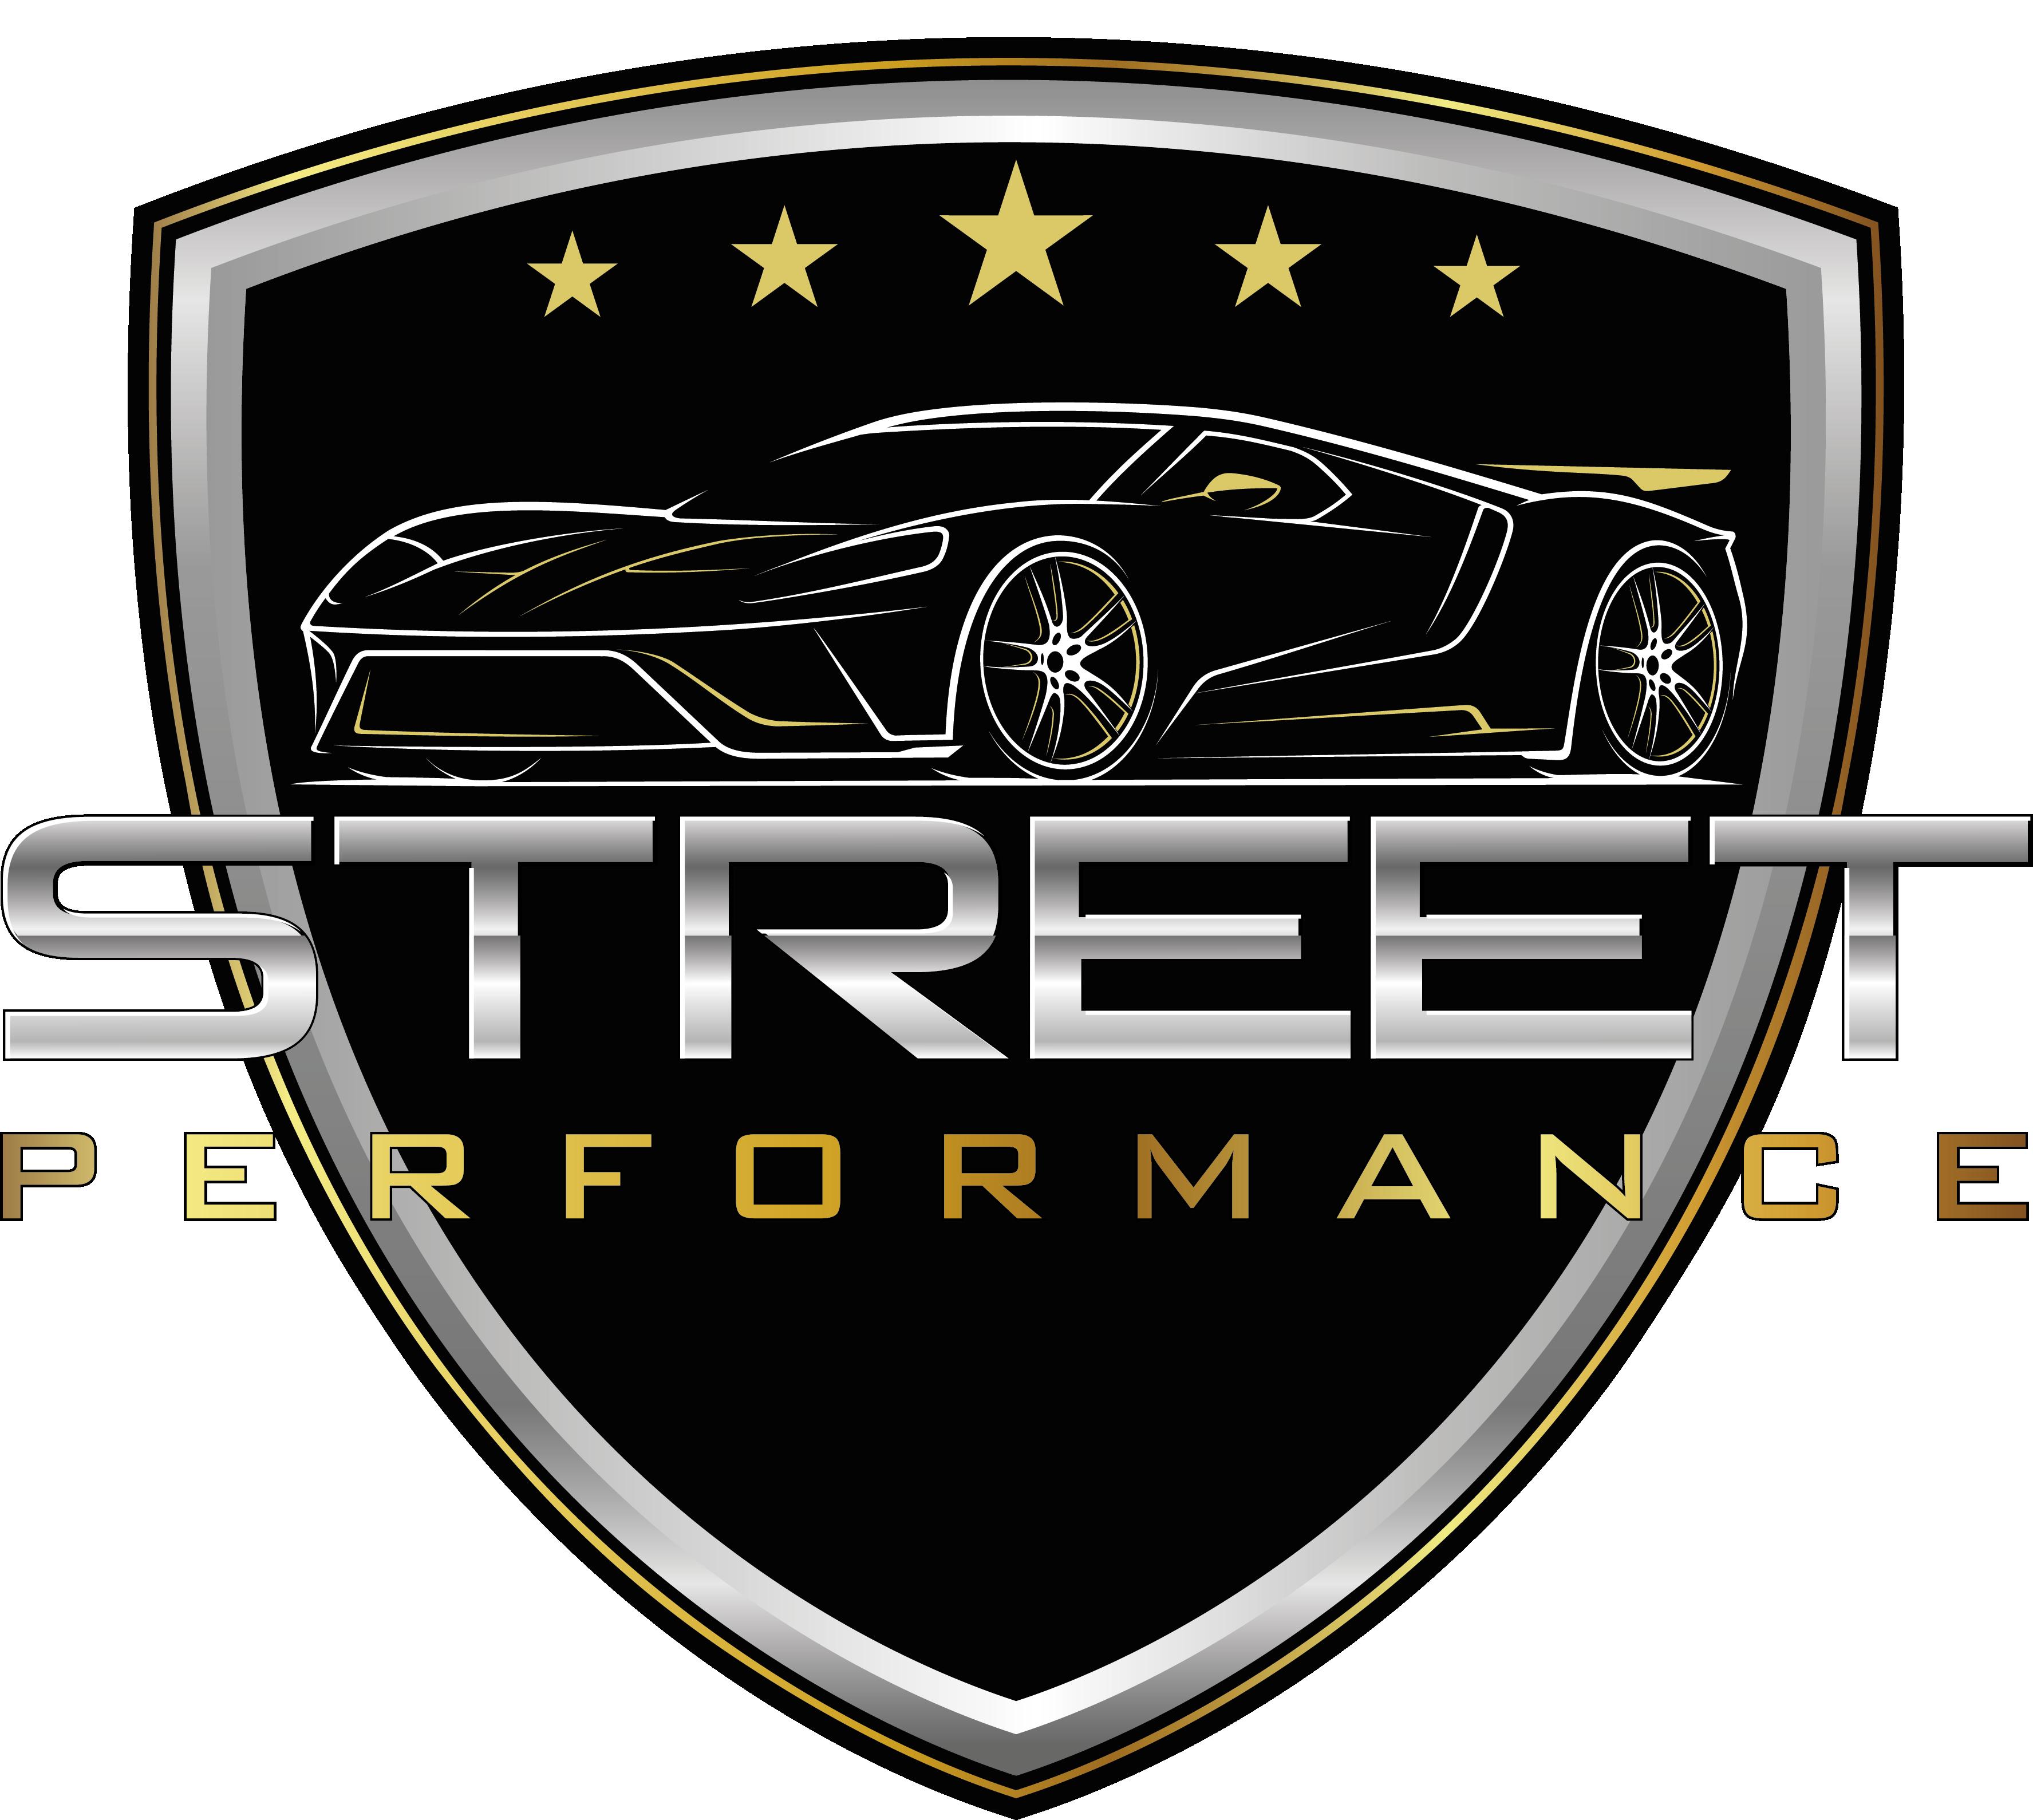 Real Street Performance